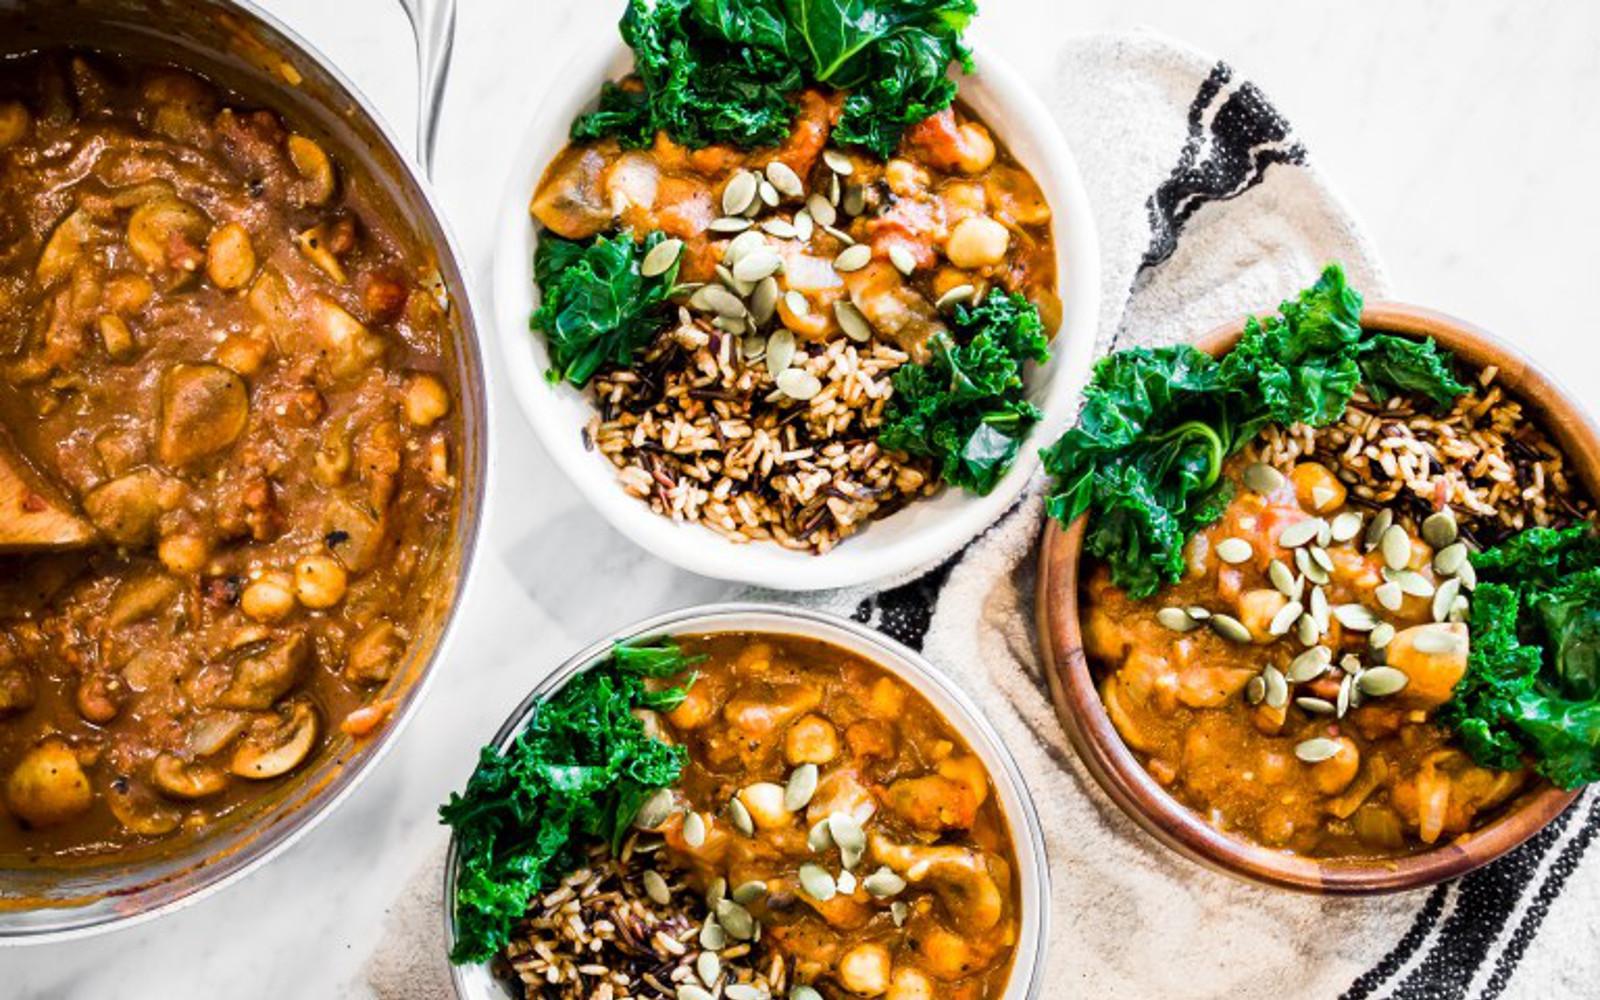 Vegan Gluten-Free Pumpkin Chili With Wild Rice with garnish